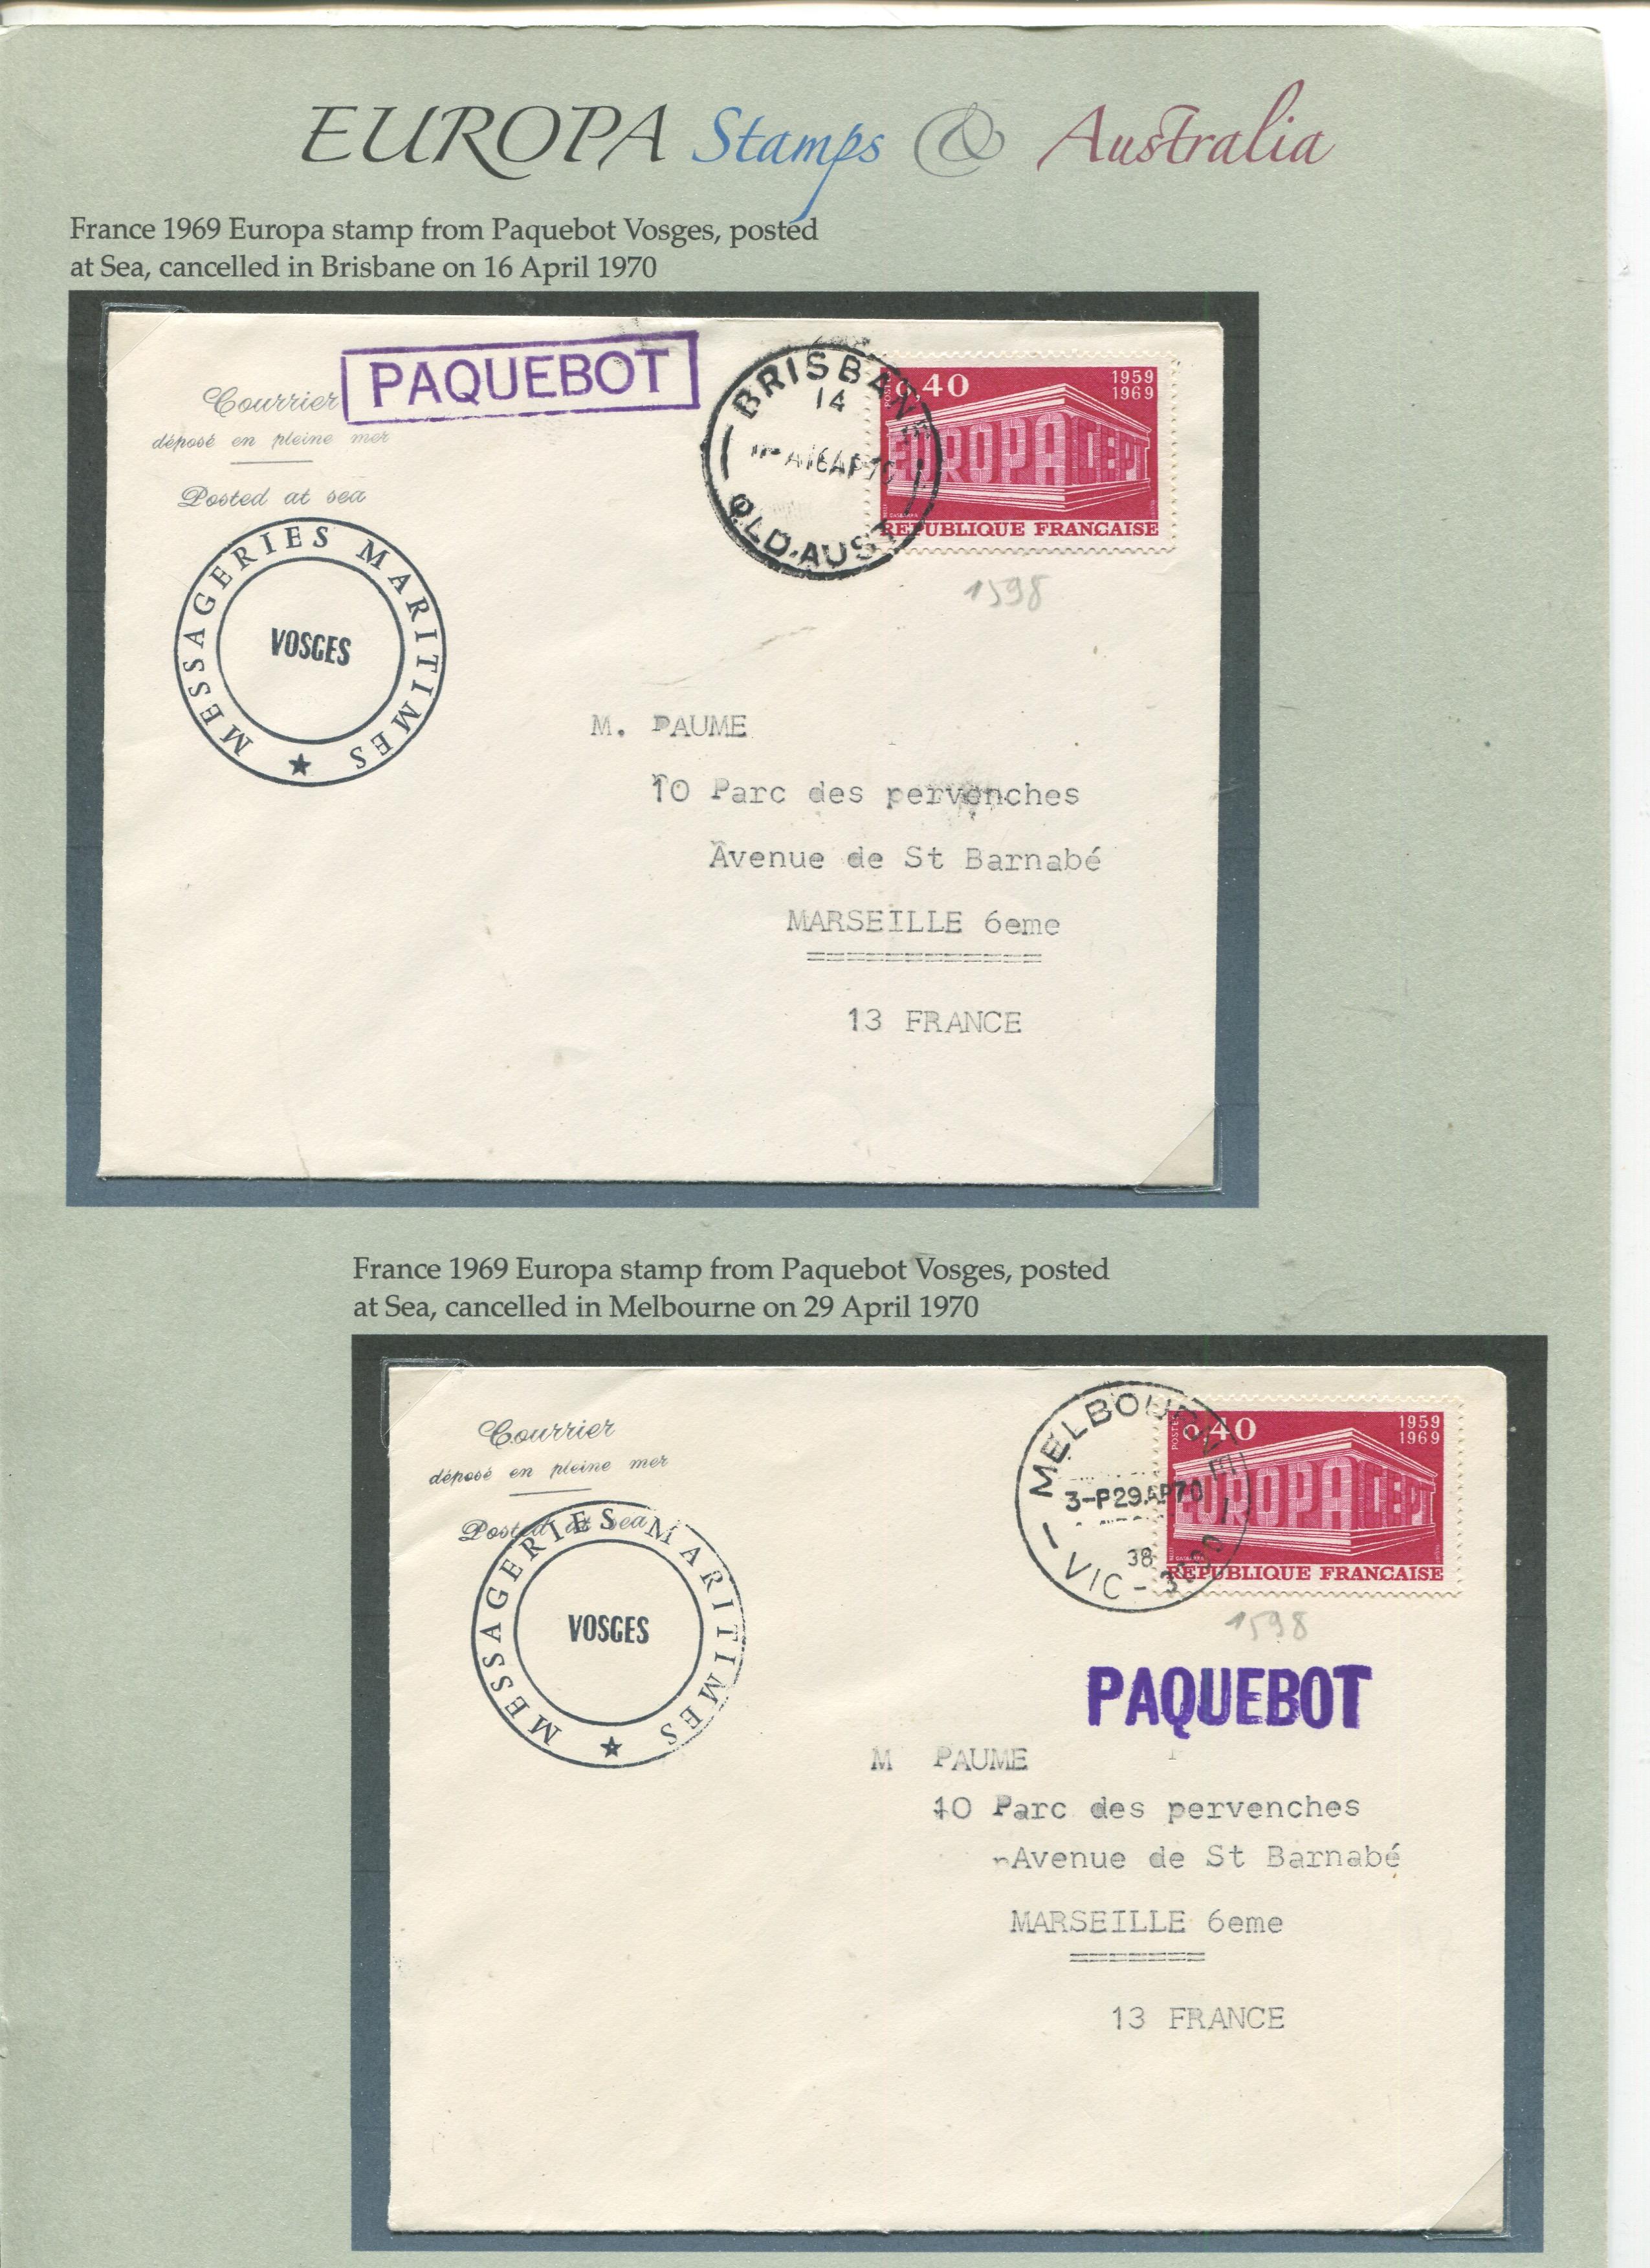 Europa Stamps postmark outside Europe…